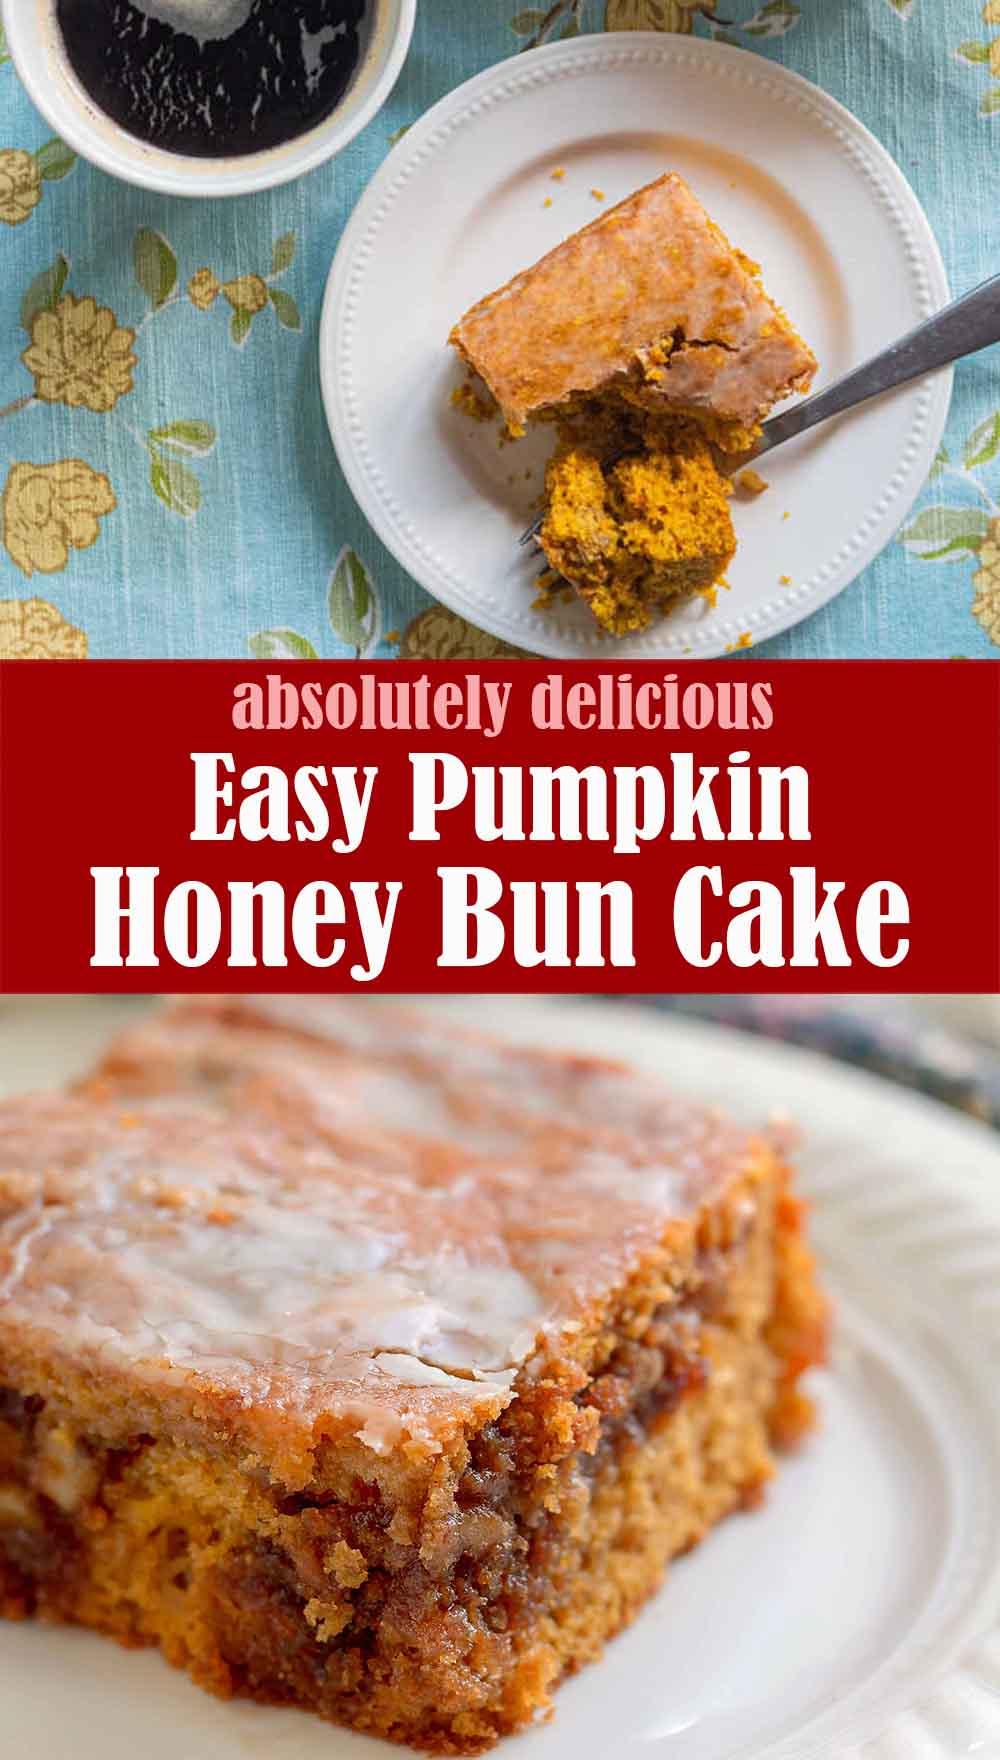 Easy Pumpkin Honey Bun Cake